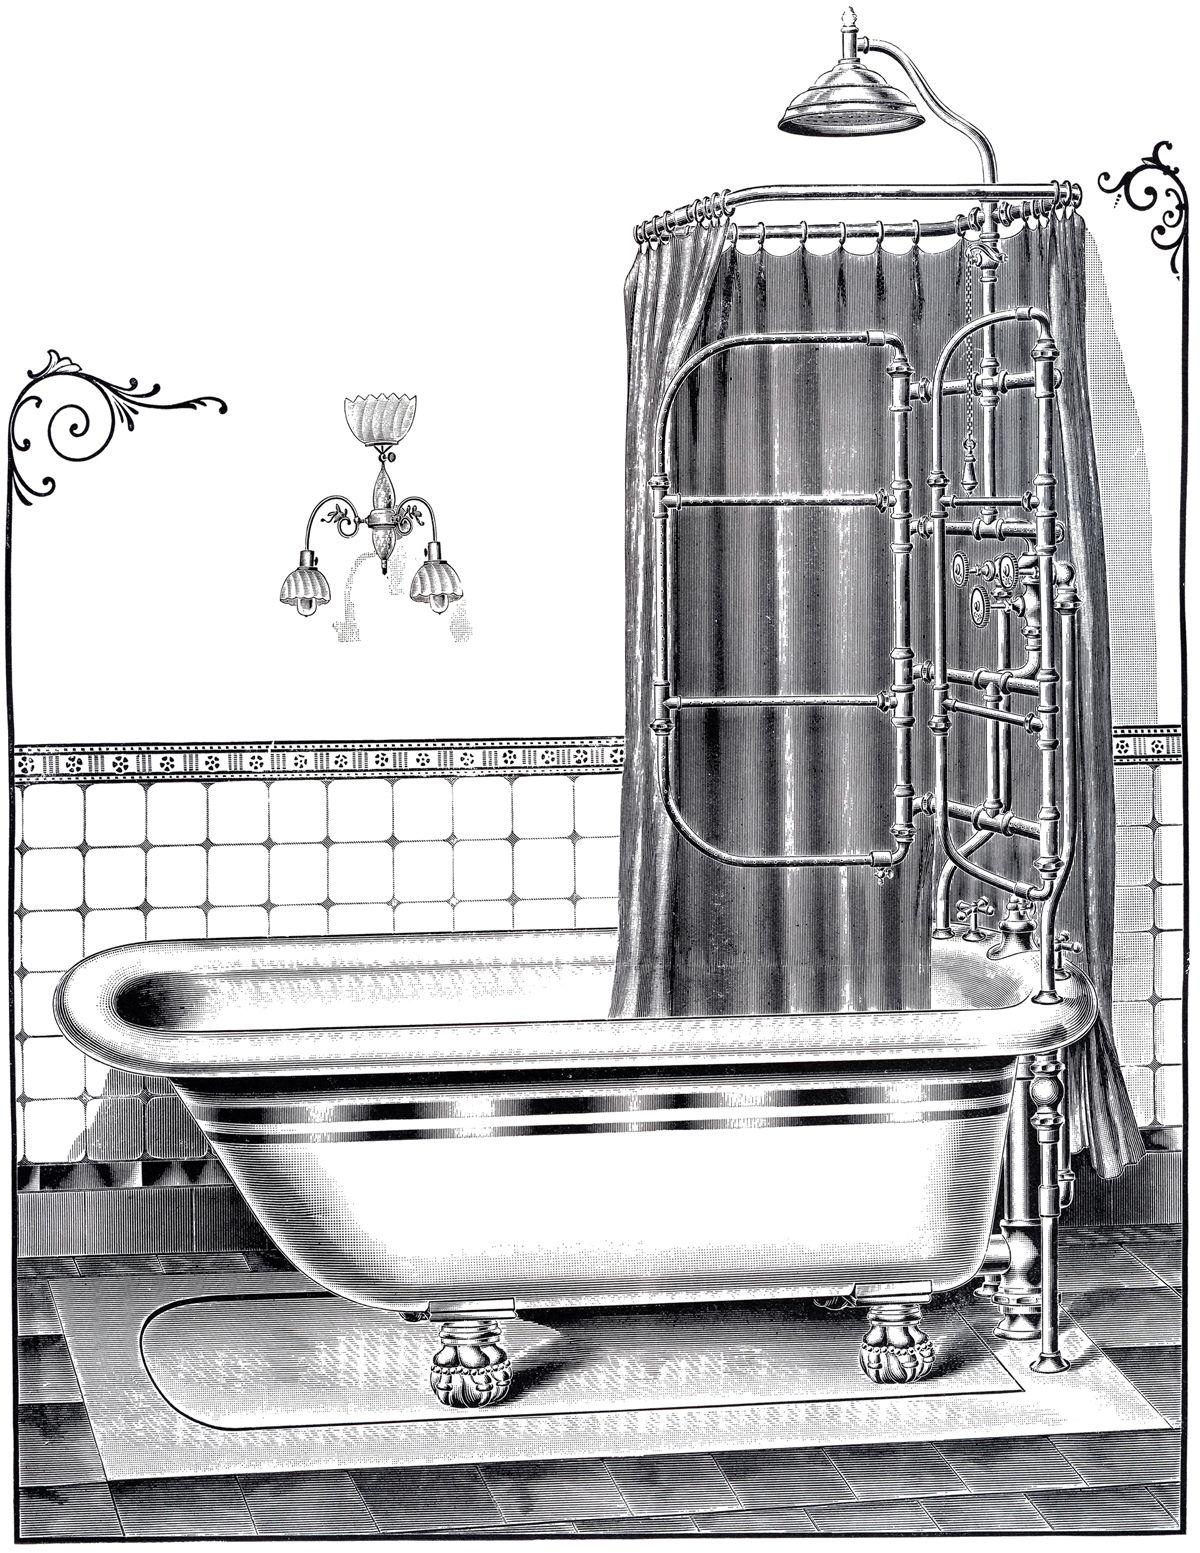 5 Vintage Bathtub And Bath Time Images Vintage Bathtub Bathroom Art Prints Bathroom Art Printables